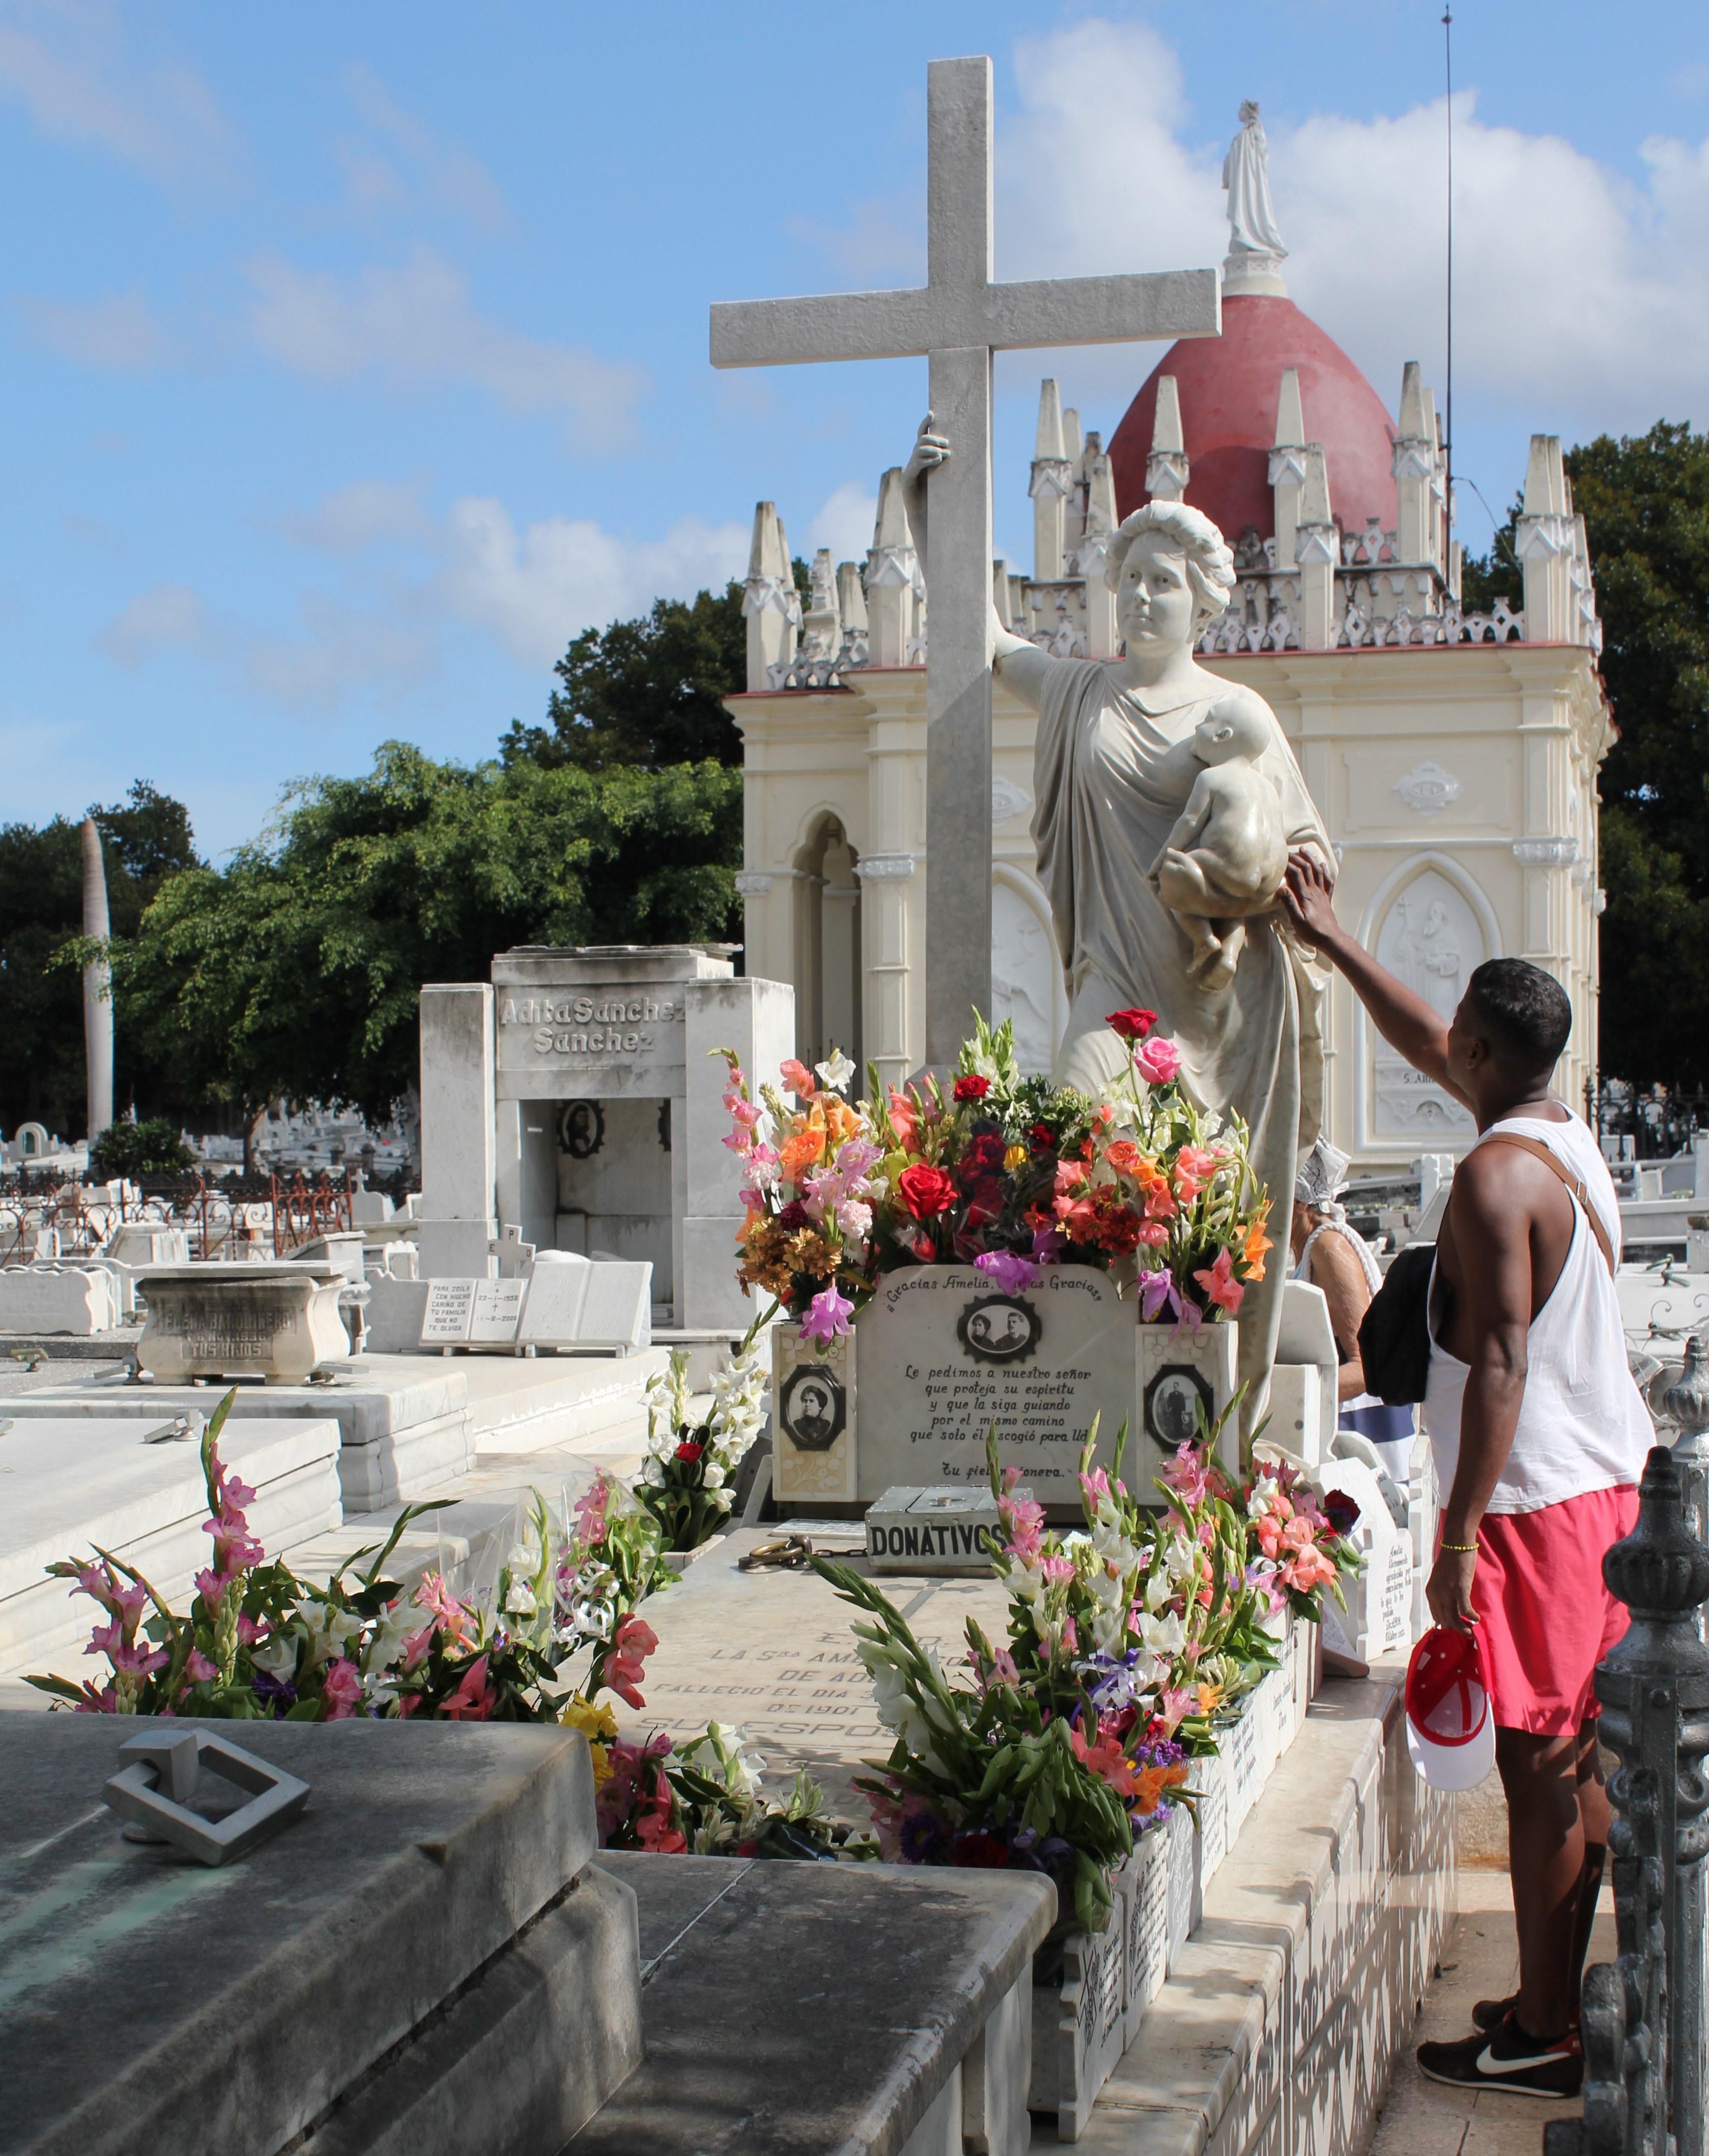 la_milagrosa_colon_cemetery_havana41 Havana has cemetery stories, too Cuba